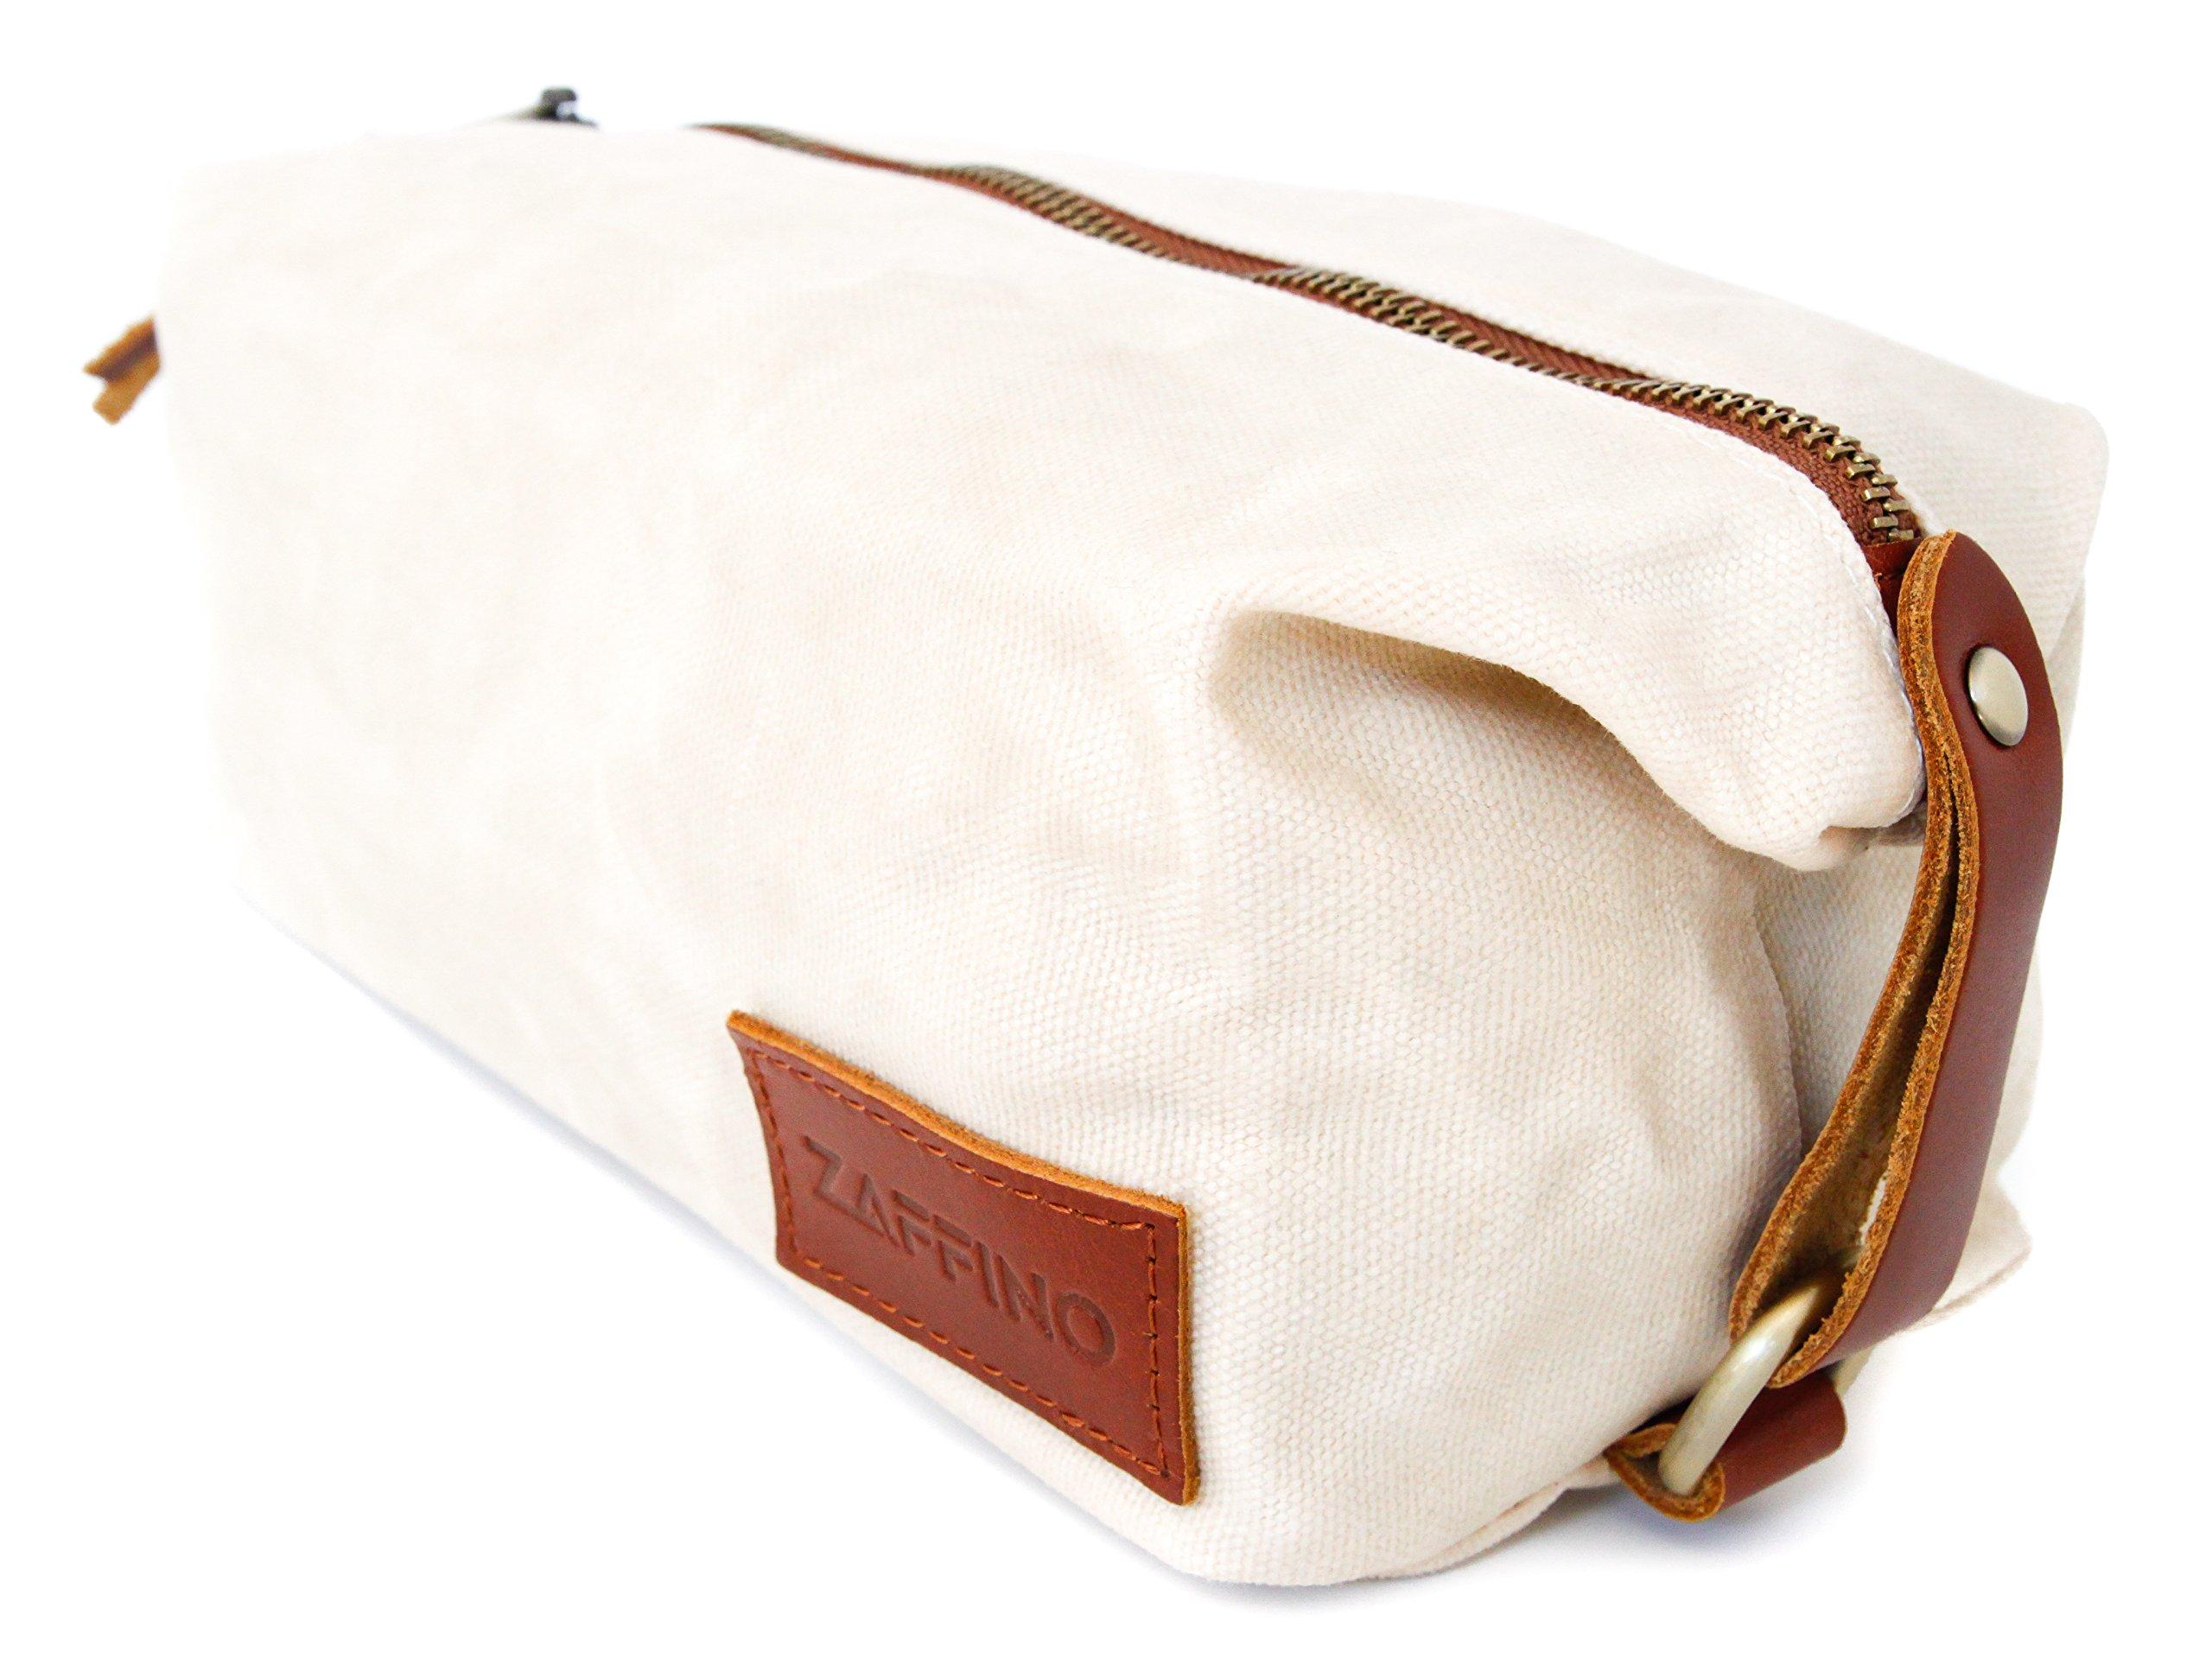 Zaffino Waxed Canvas Genuine Leather Trim Dopp Kit - Unisex Toiletry Bag & Travel Kit